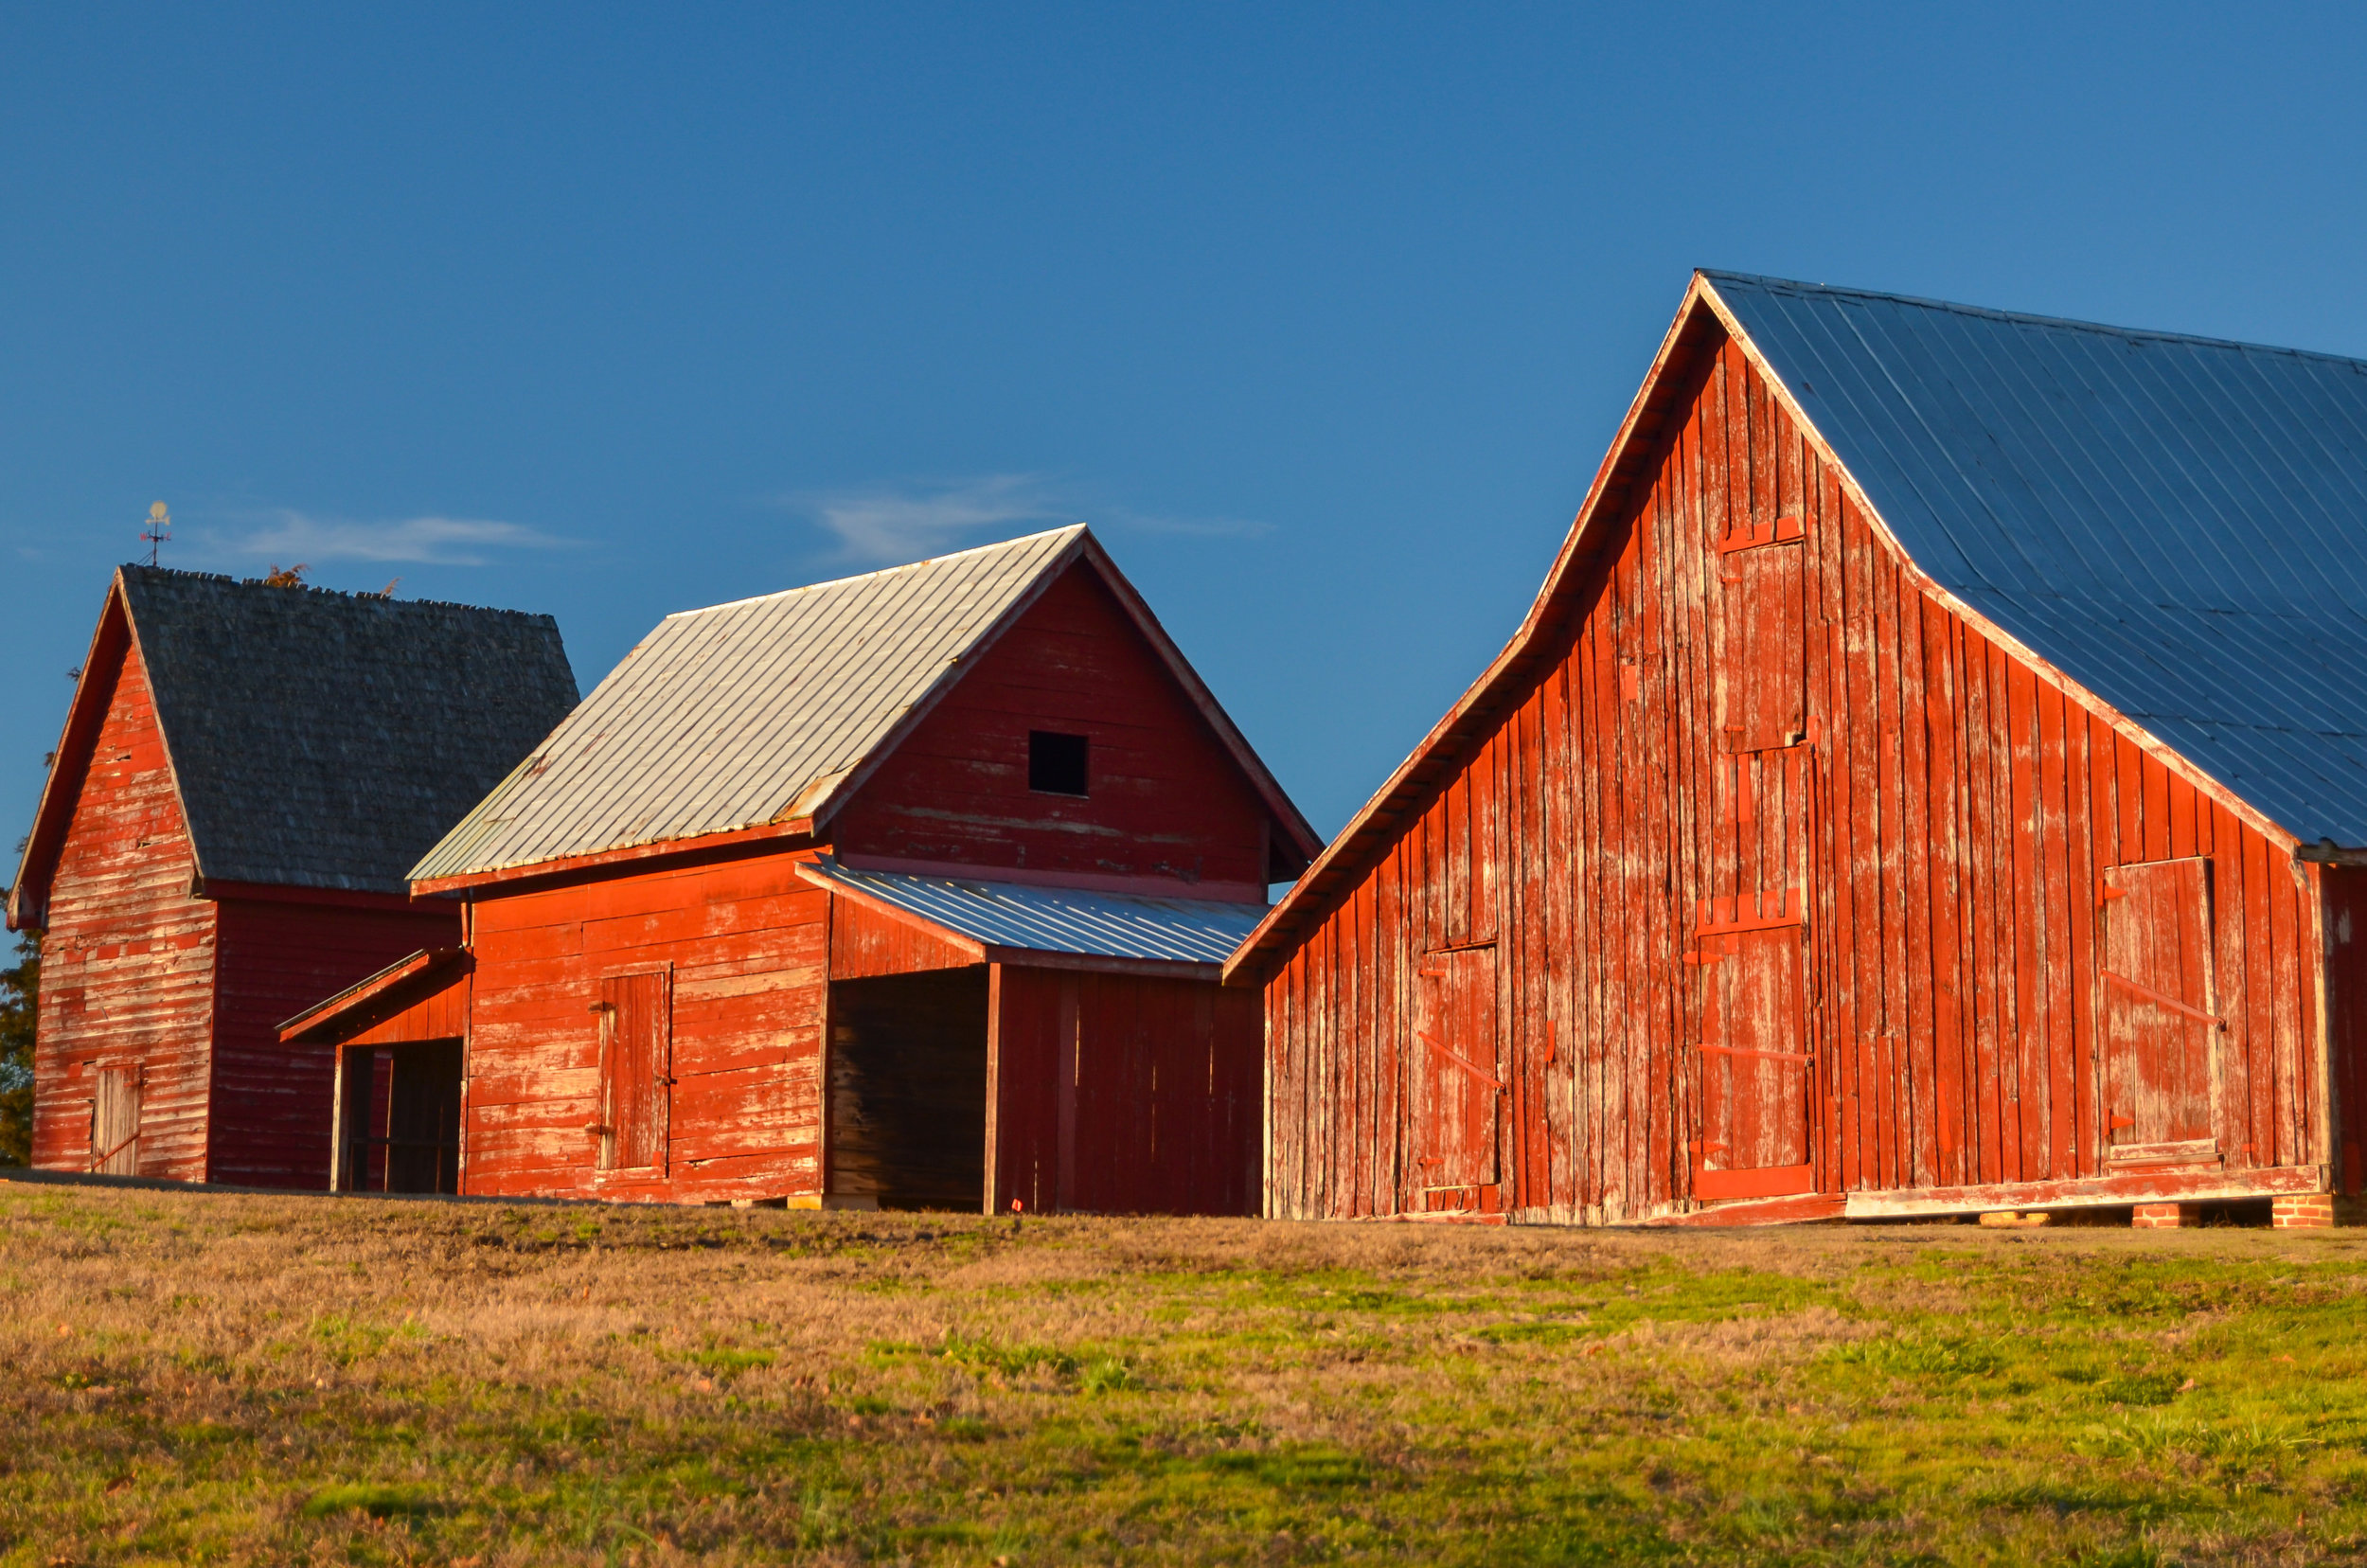 red barns-smithfield-windsor castle park-isle of wight county-virginia-2.jpg